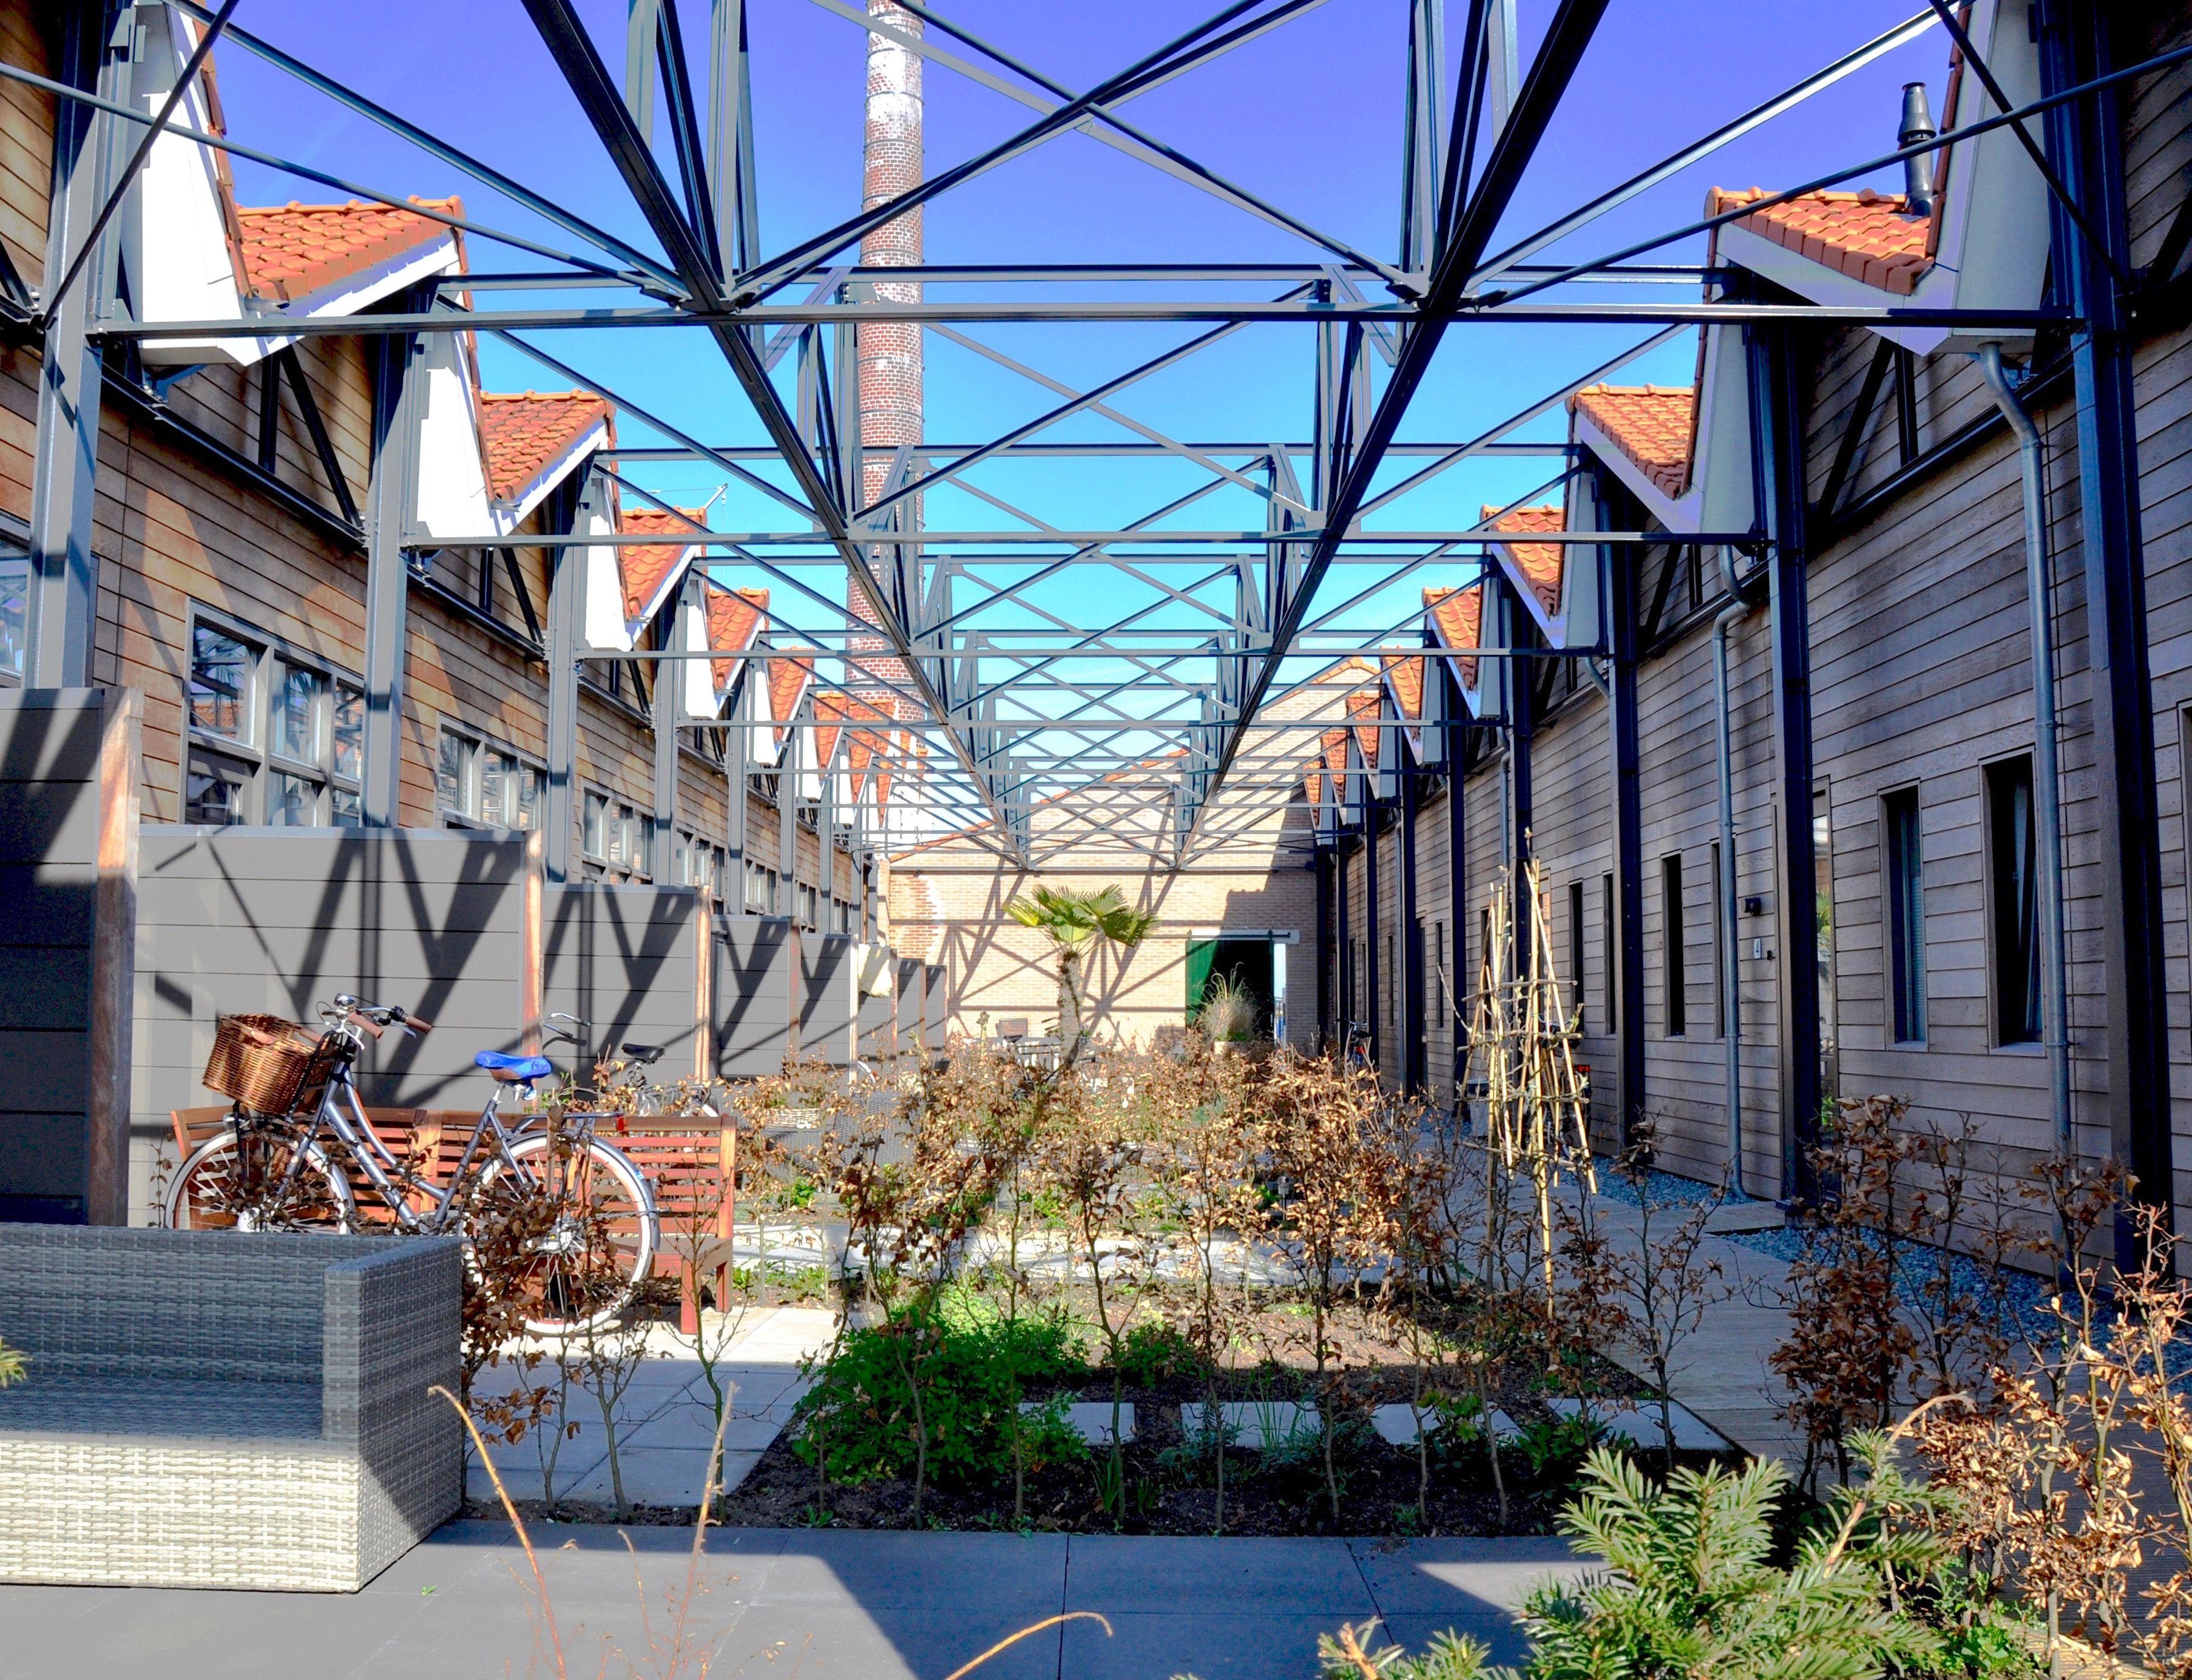 opengemaakte dak fabriekshal